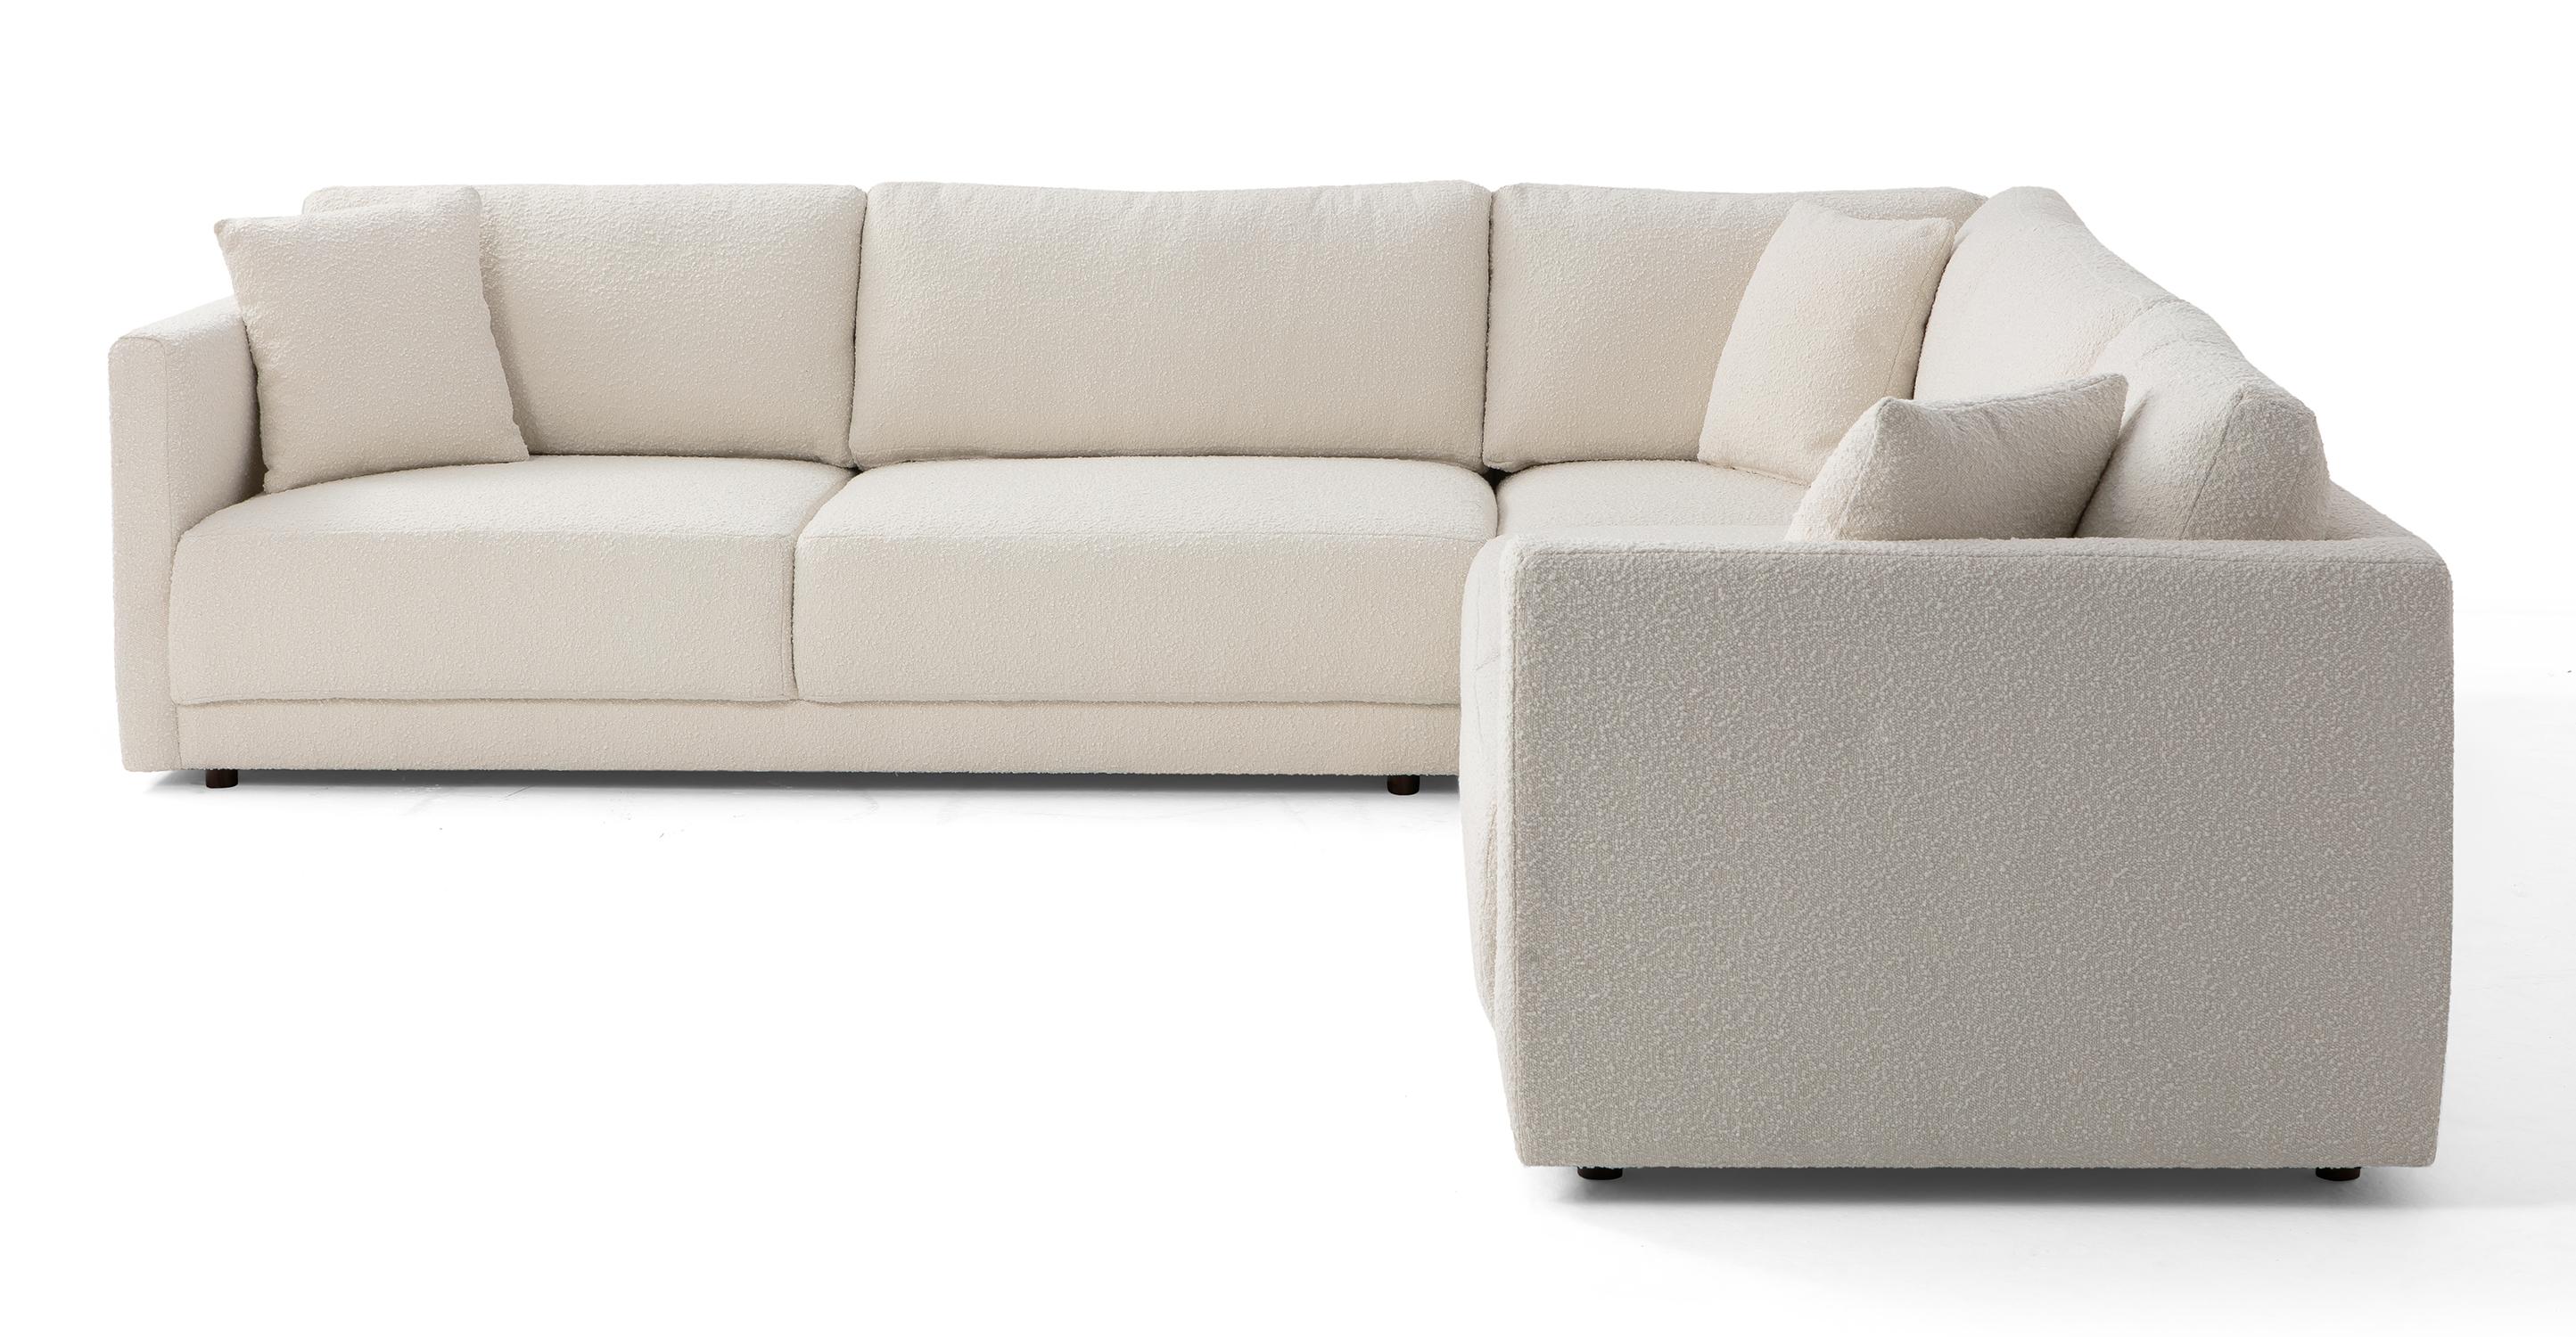 "Domus 116"" 3-pc L Corner Sofa Sectional, Blanc Boucle"